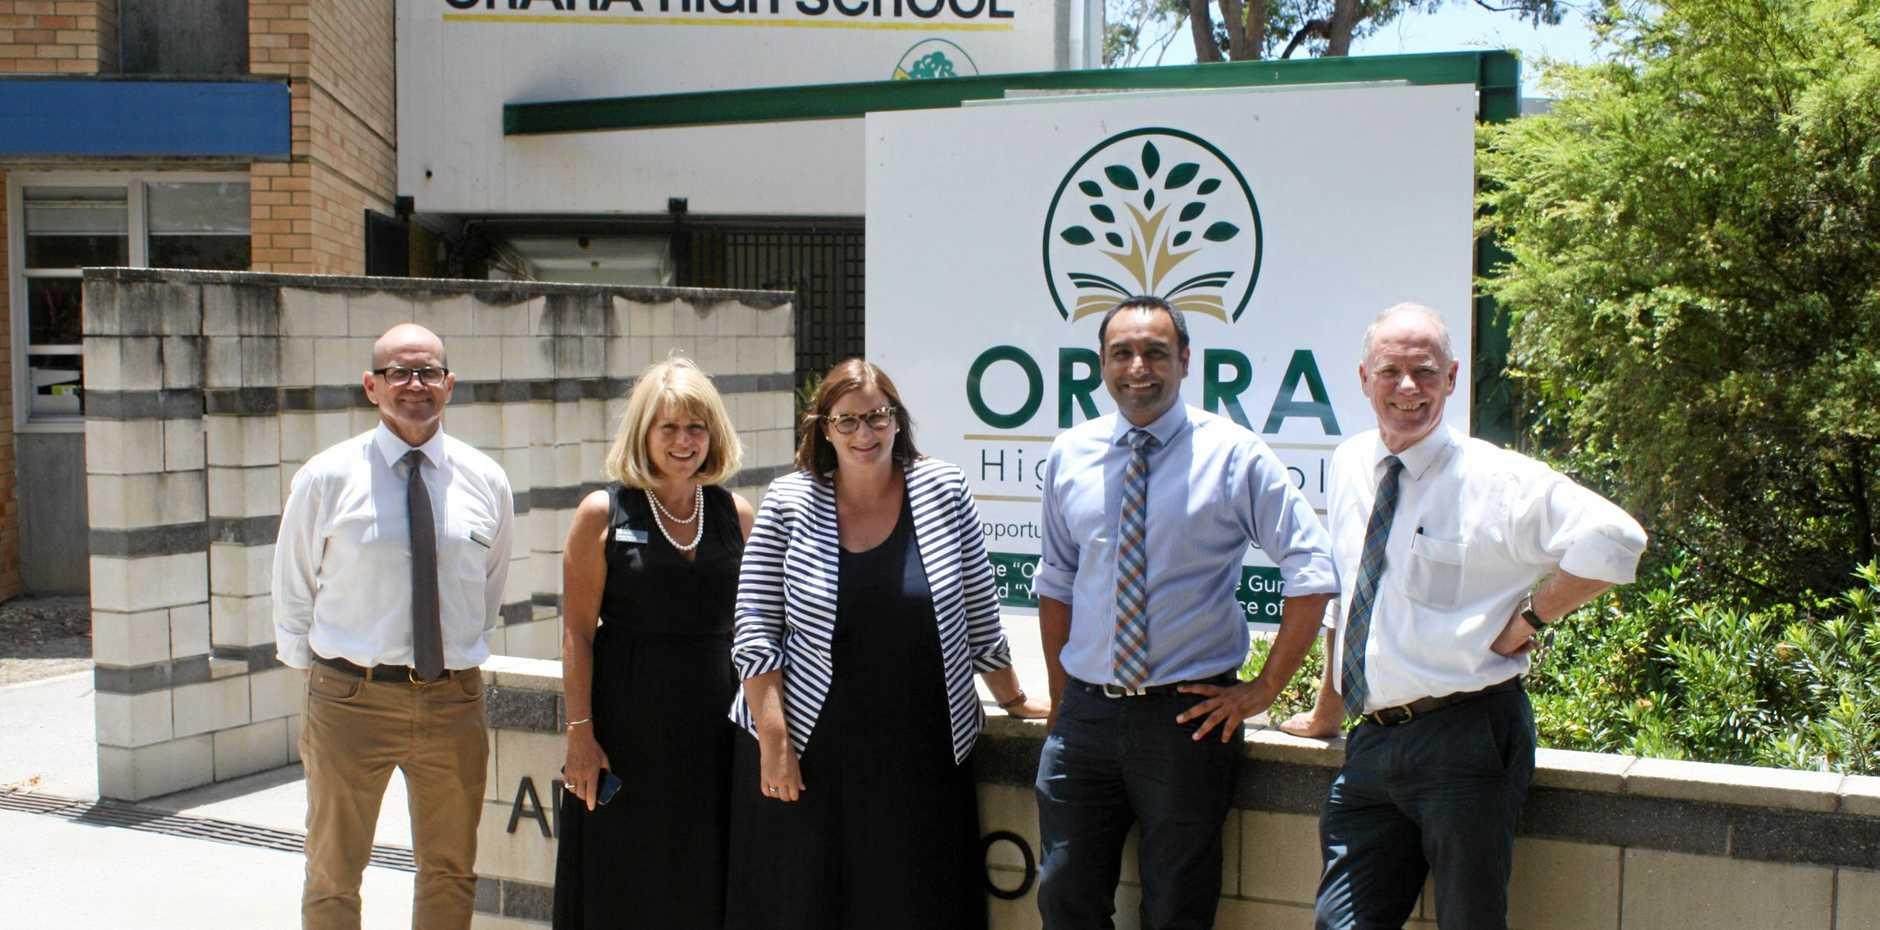 L-R: Orara High School principal Malcolm McFarlane, Department of Education director educational leadership Jenny Murray, Sarah Mitchell, Gurmesh Singh and Andrew Fraser at Orara High School.